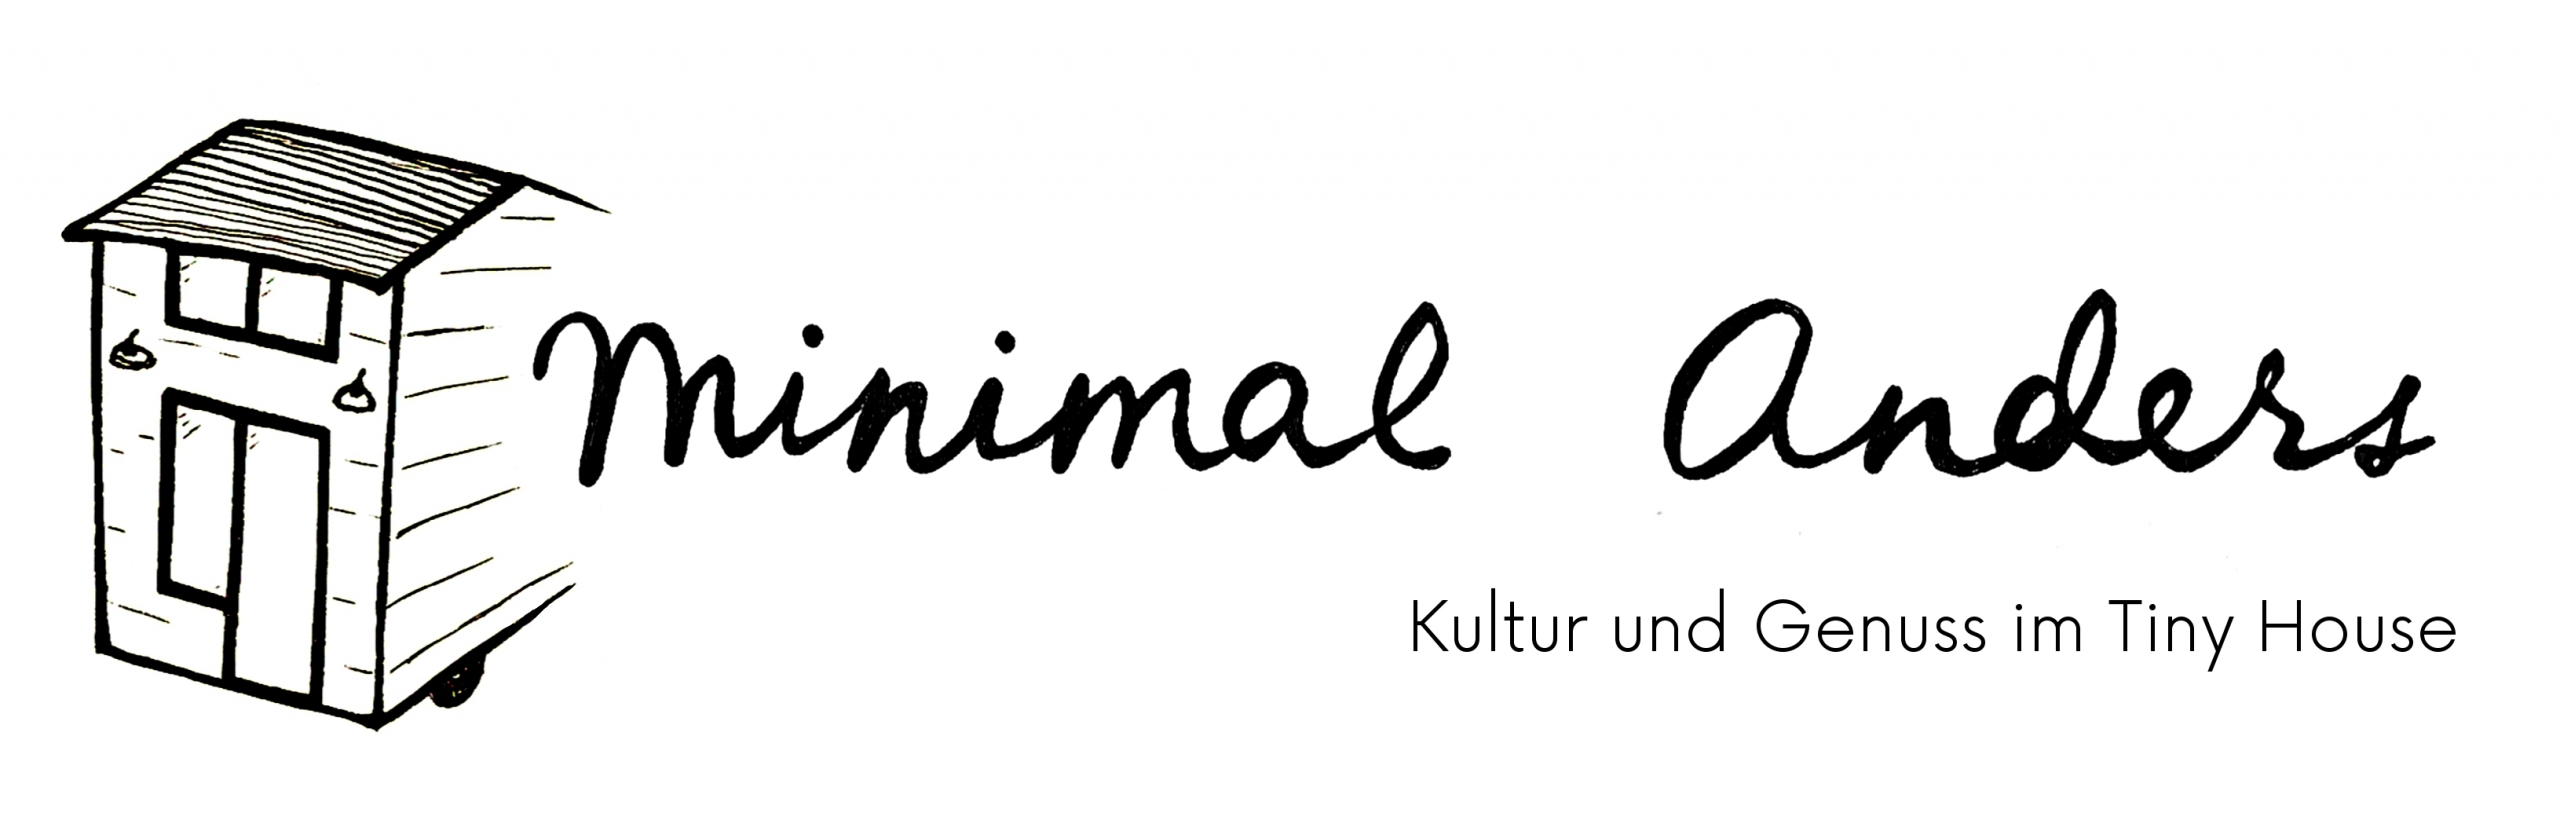 Tiny House Bayern Logo Minimal Anders